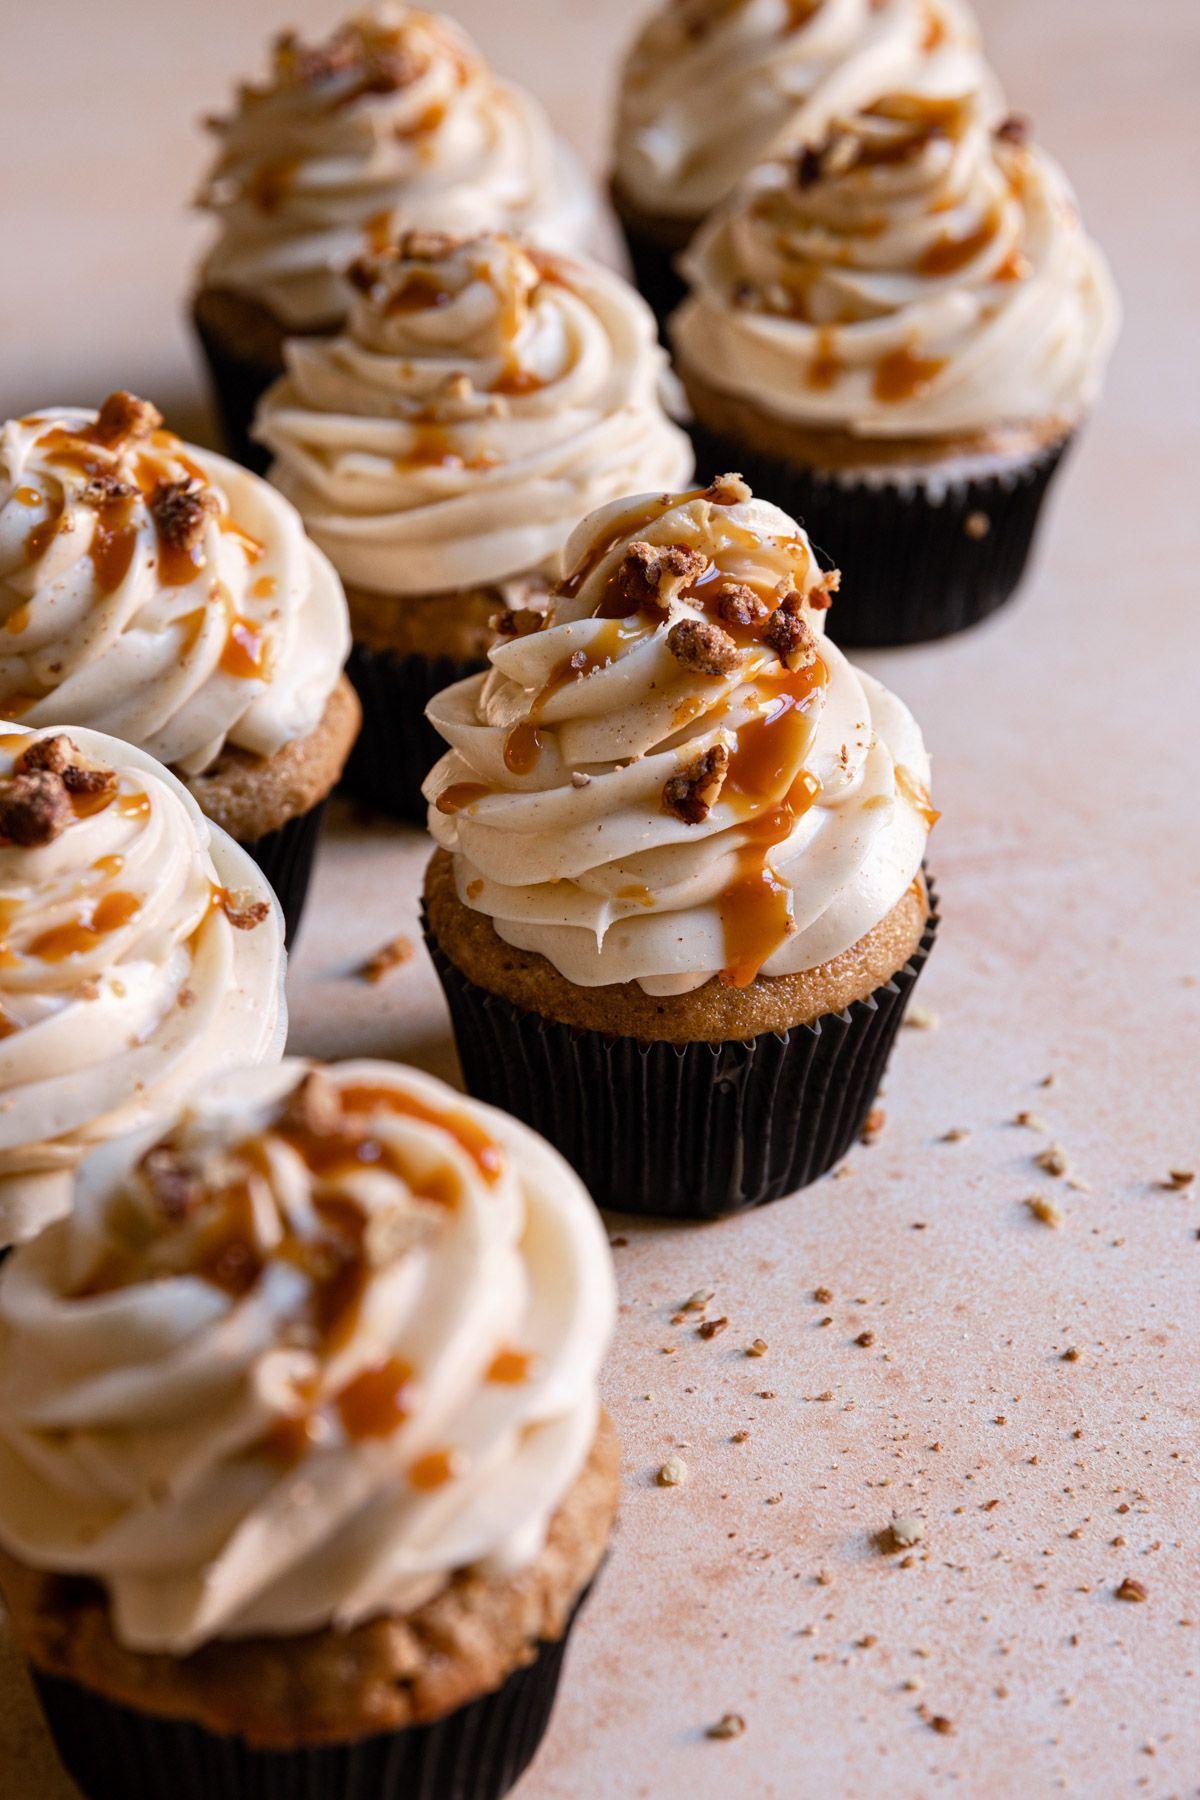 Chai Cupcakes Are Little Comforting Cakes Bursting With Warm Spices Rezept Kuchen Und Torten Kuchen Rezepte Rezept Fur Cupcakes